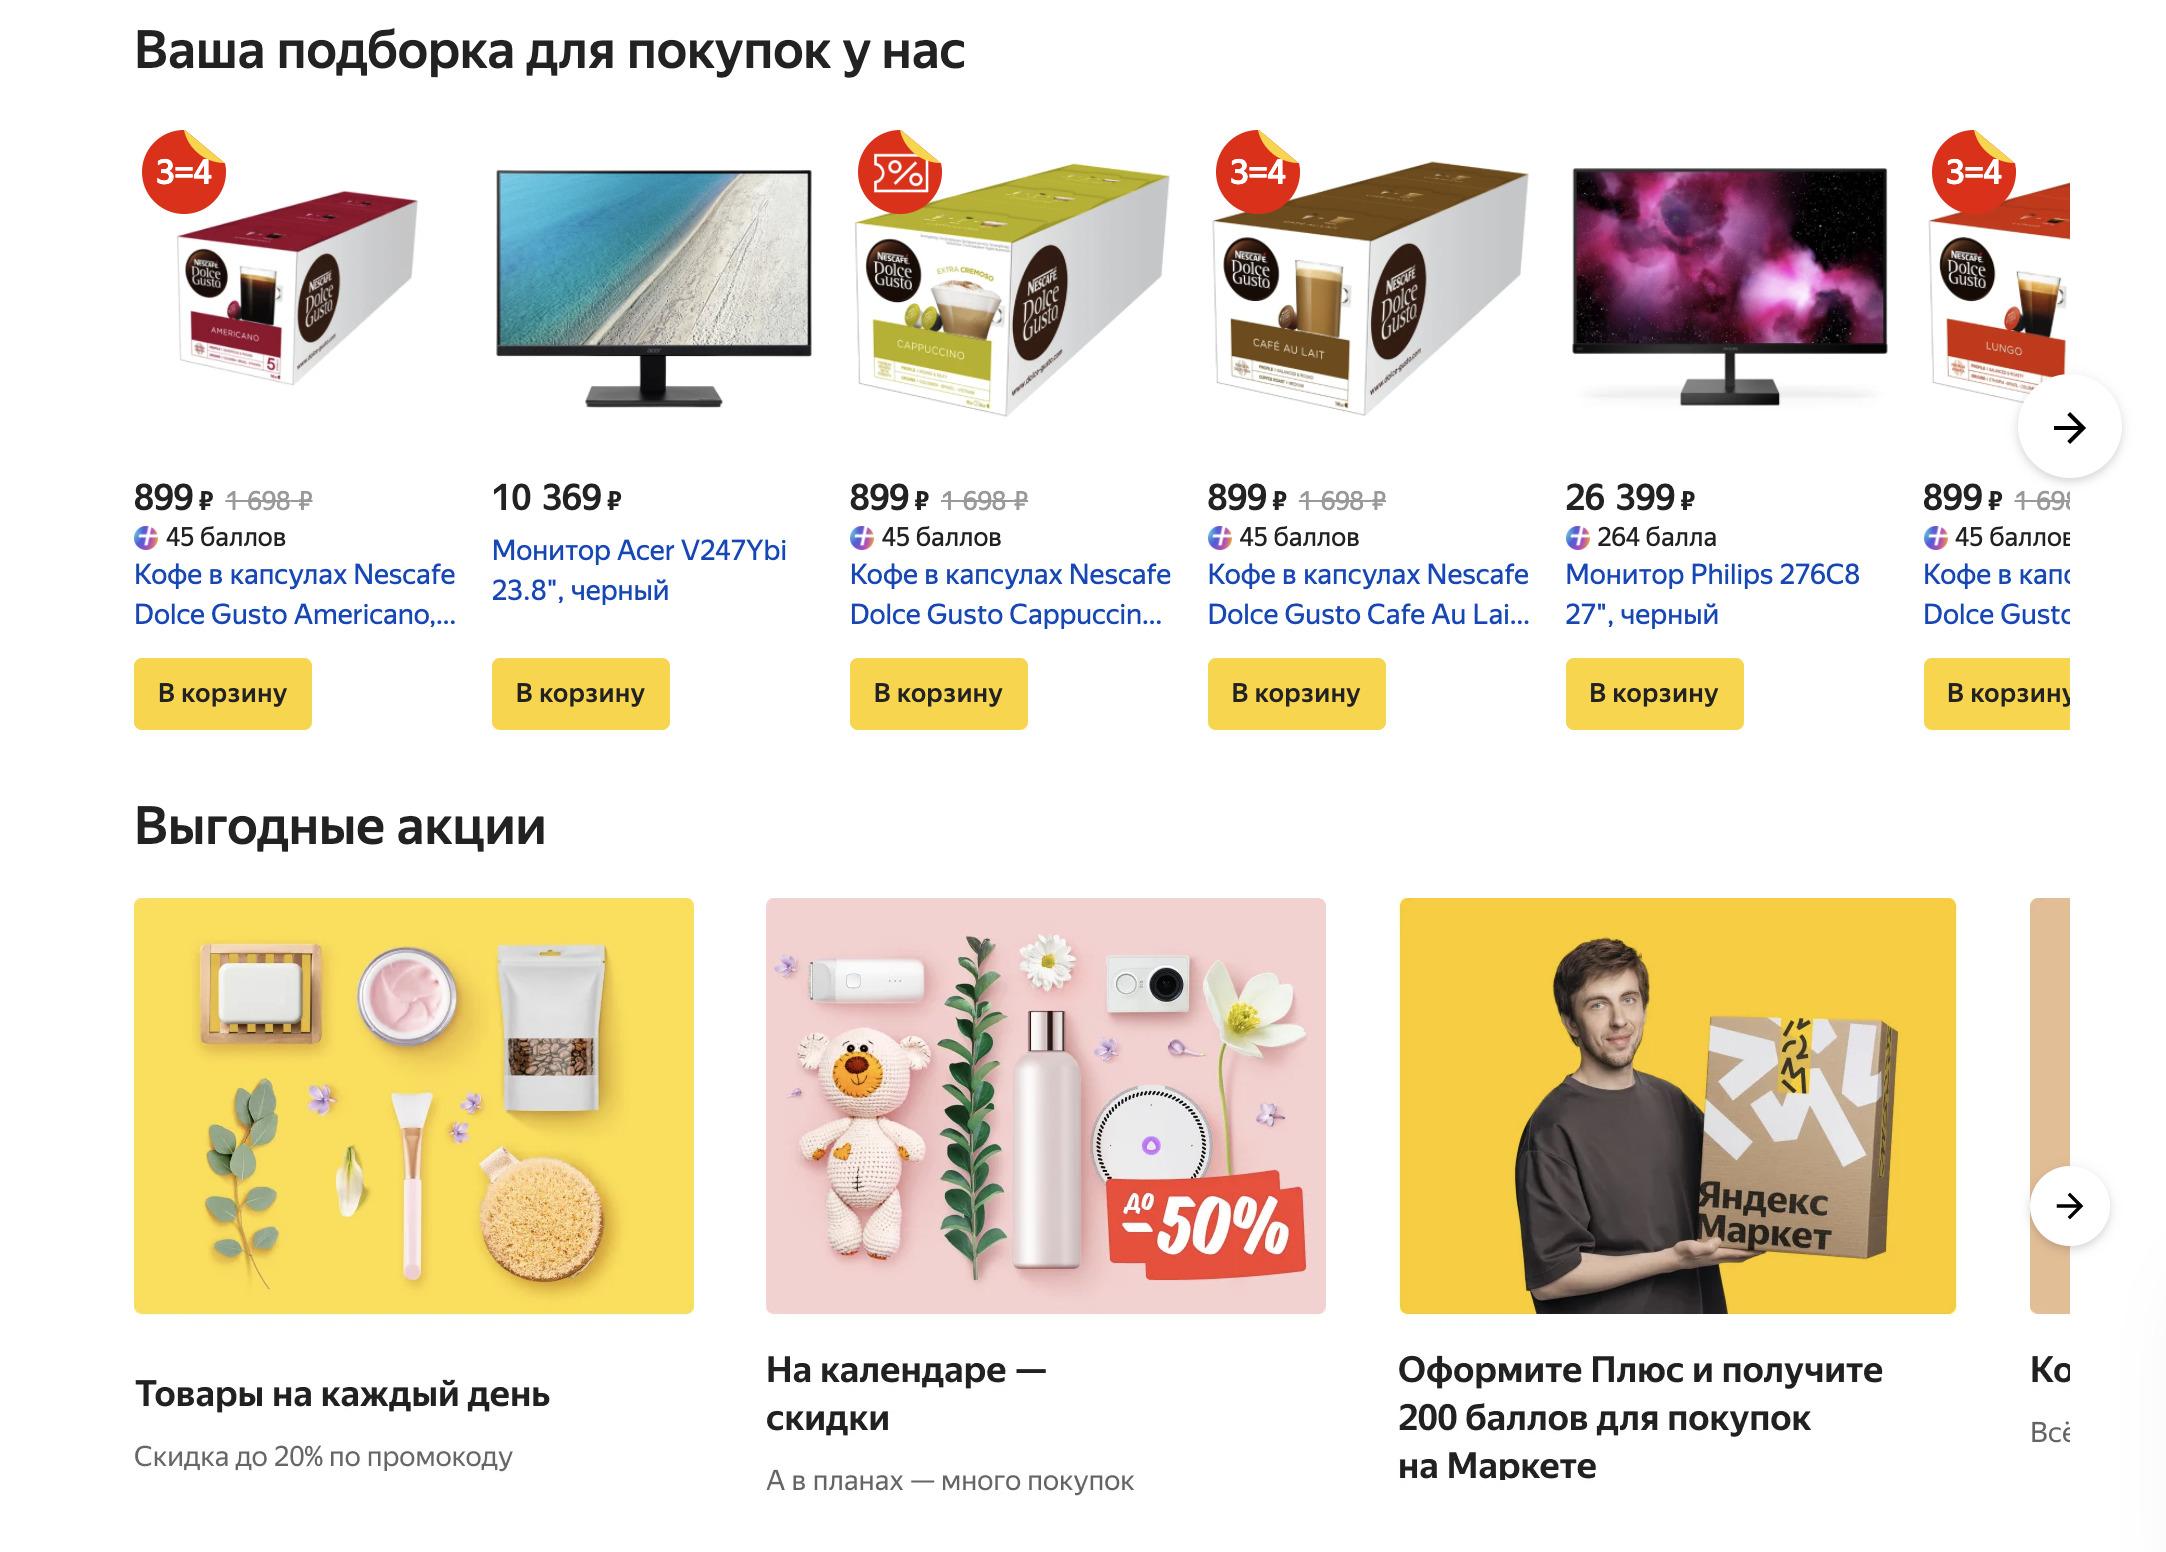 Доставка из Яндекс.Маркет в Татарстан, сроки, пункты выдачи, каталог